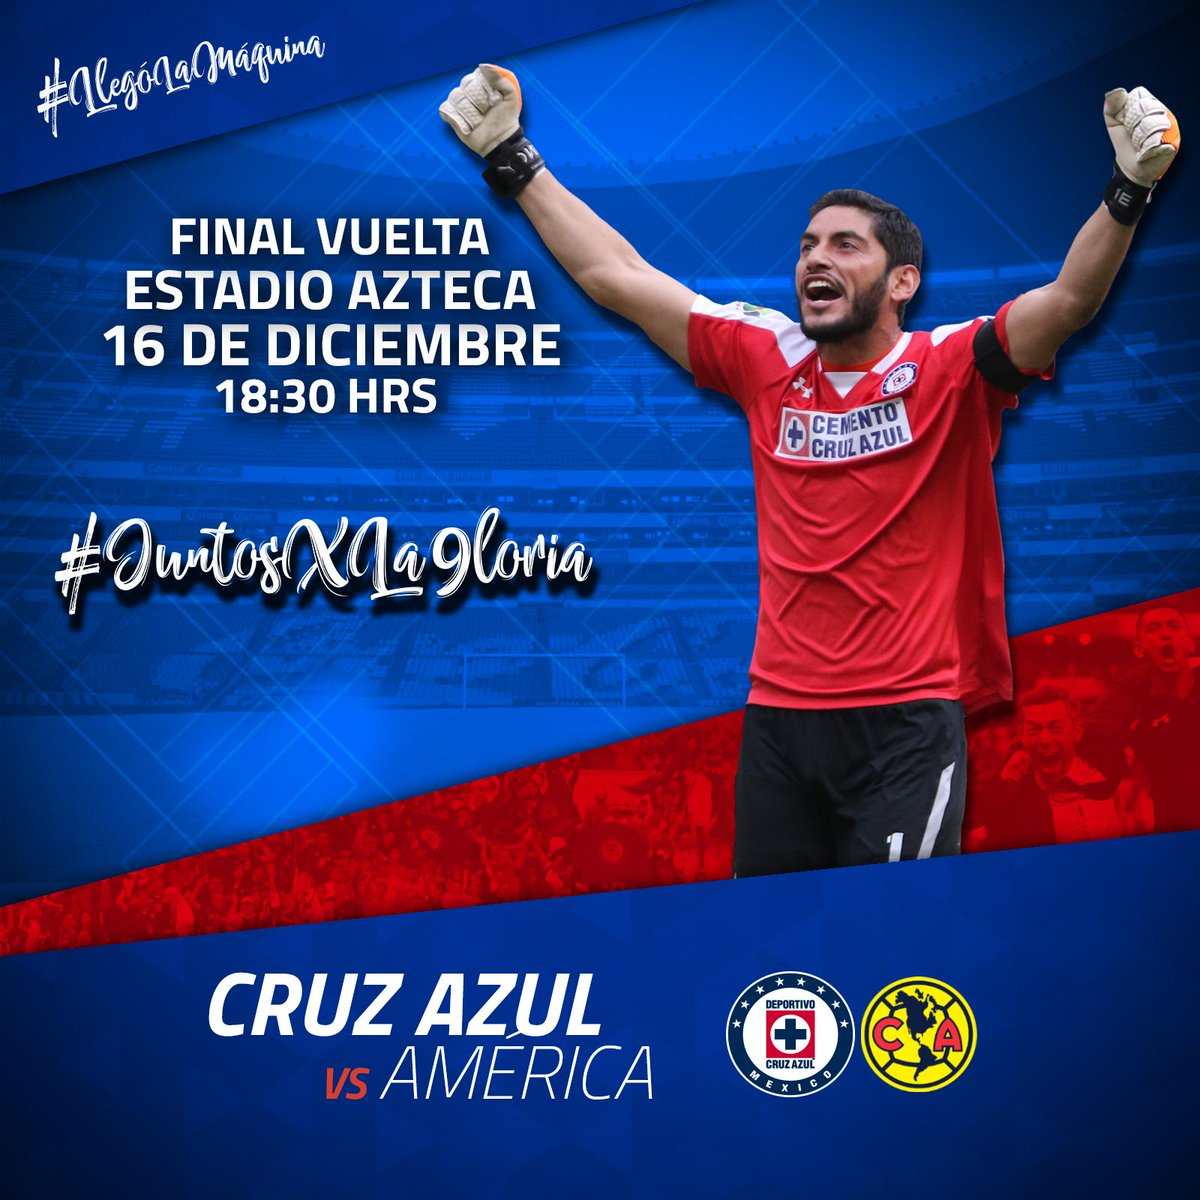 CRUZ AZUL FC ®'s photo on Domingo 16